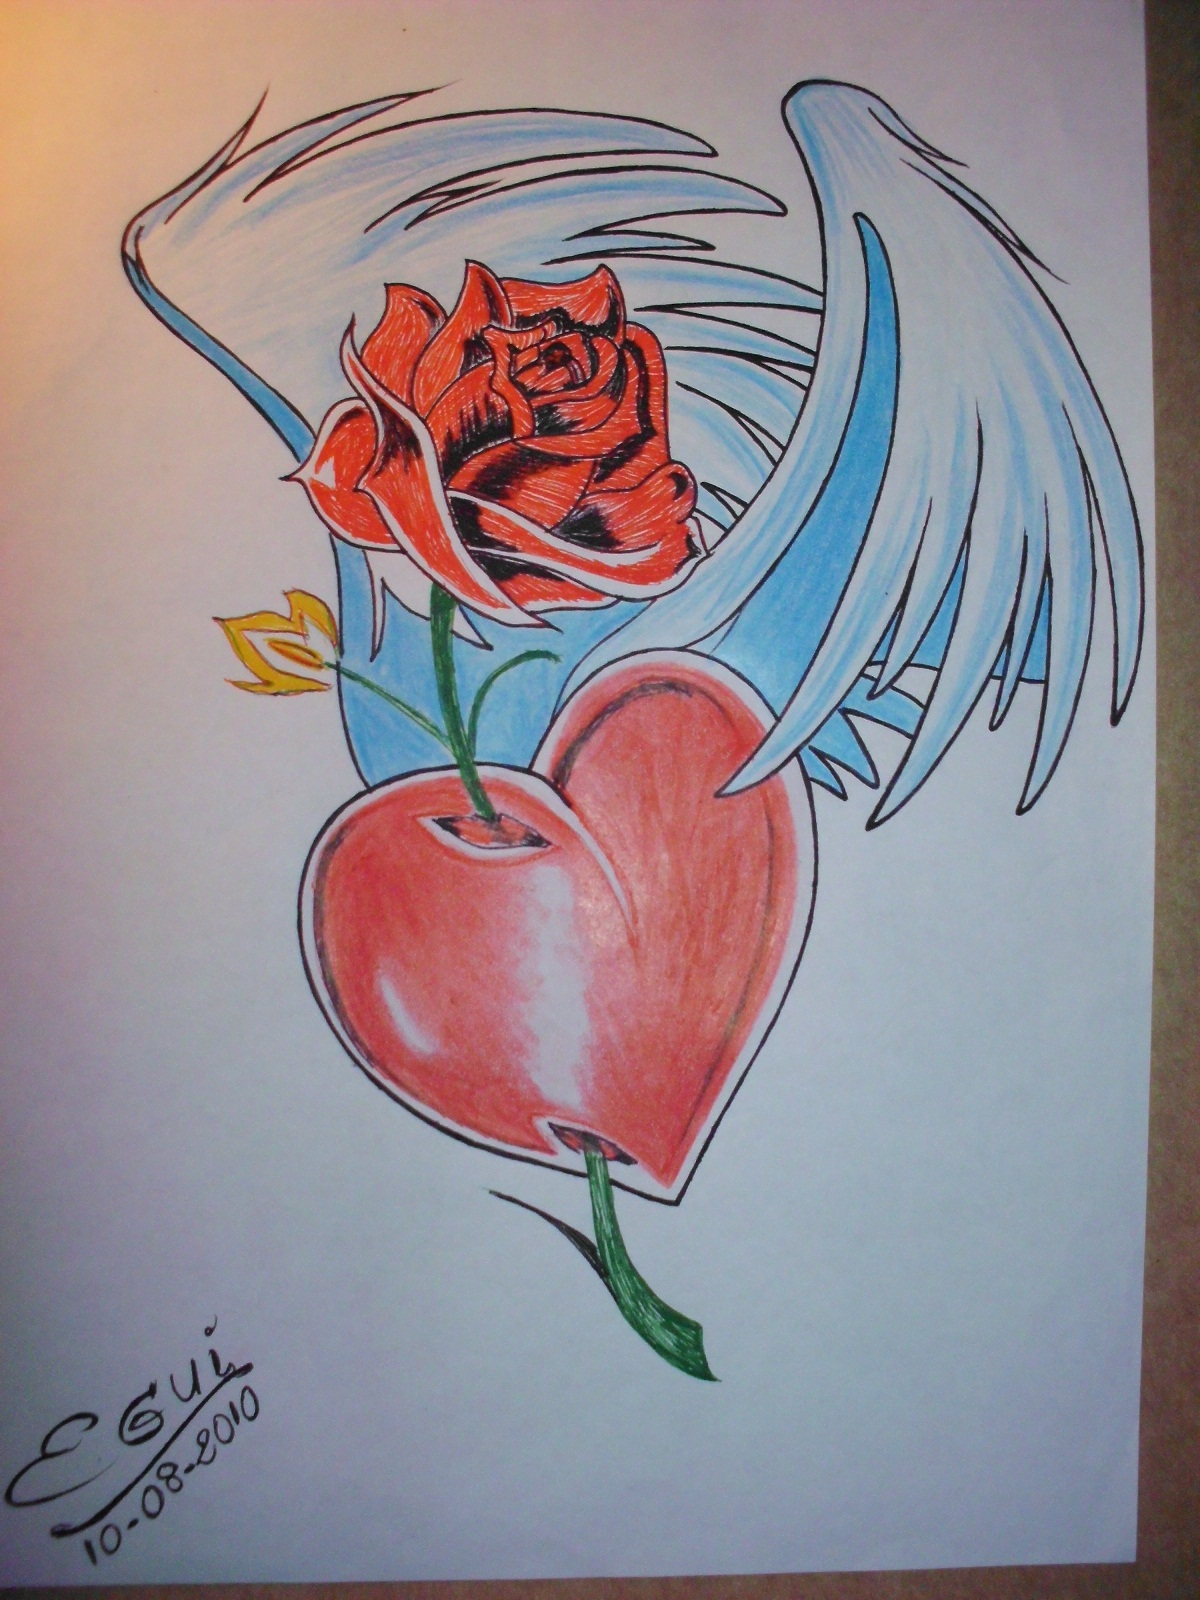 Fresco Imagenes De Flores Para Colorear A Lapiz   Colore Ar La Imagen